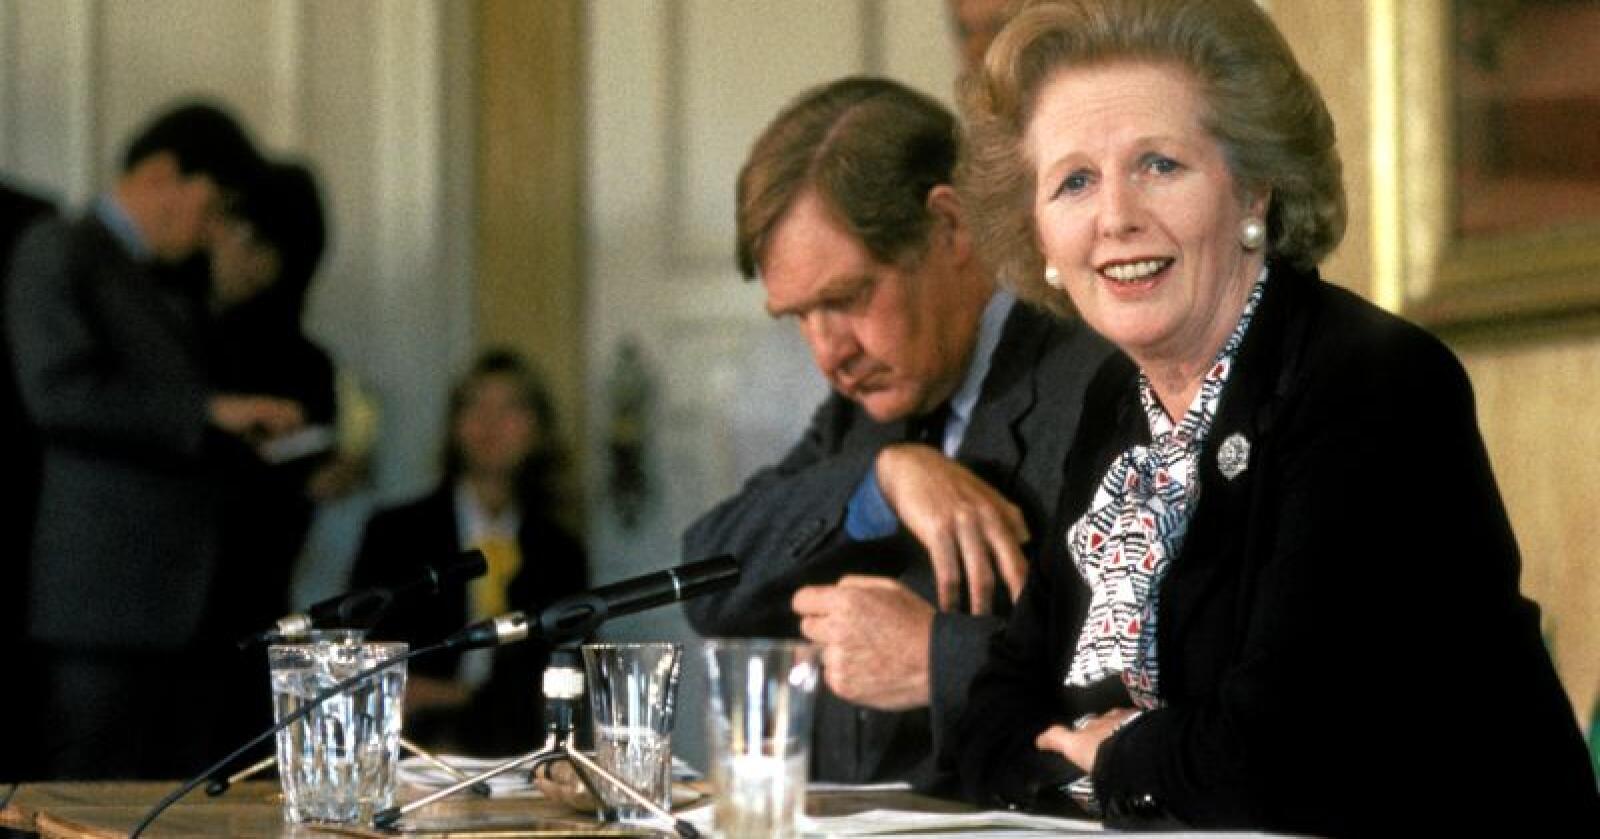 Margaret Thatcher: Slett ingen integrasjonist, skriver kronikøren. Foto: Bjørn Sigurdsøn/NTB Scanpix